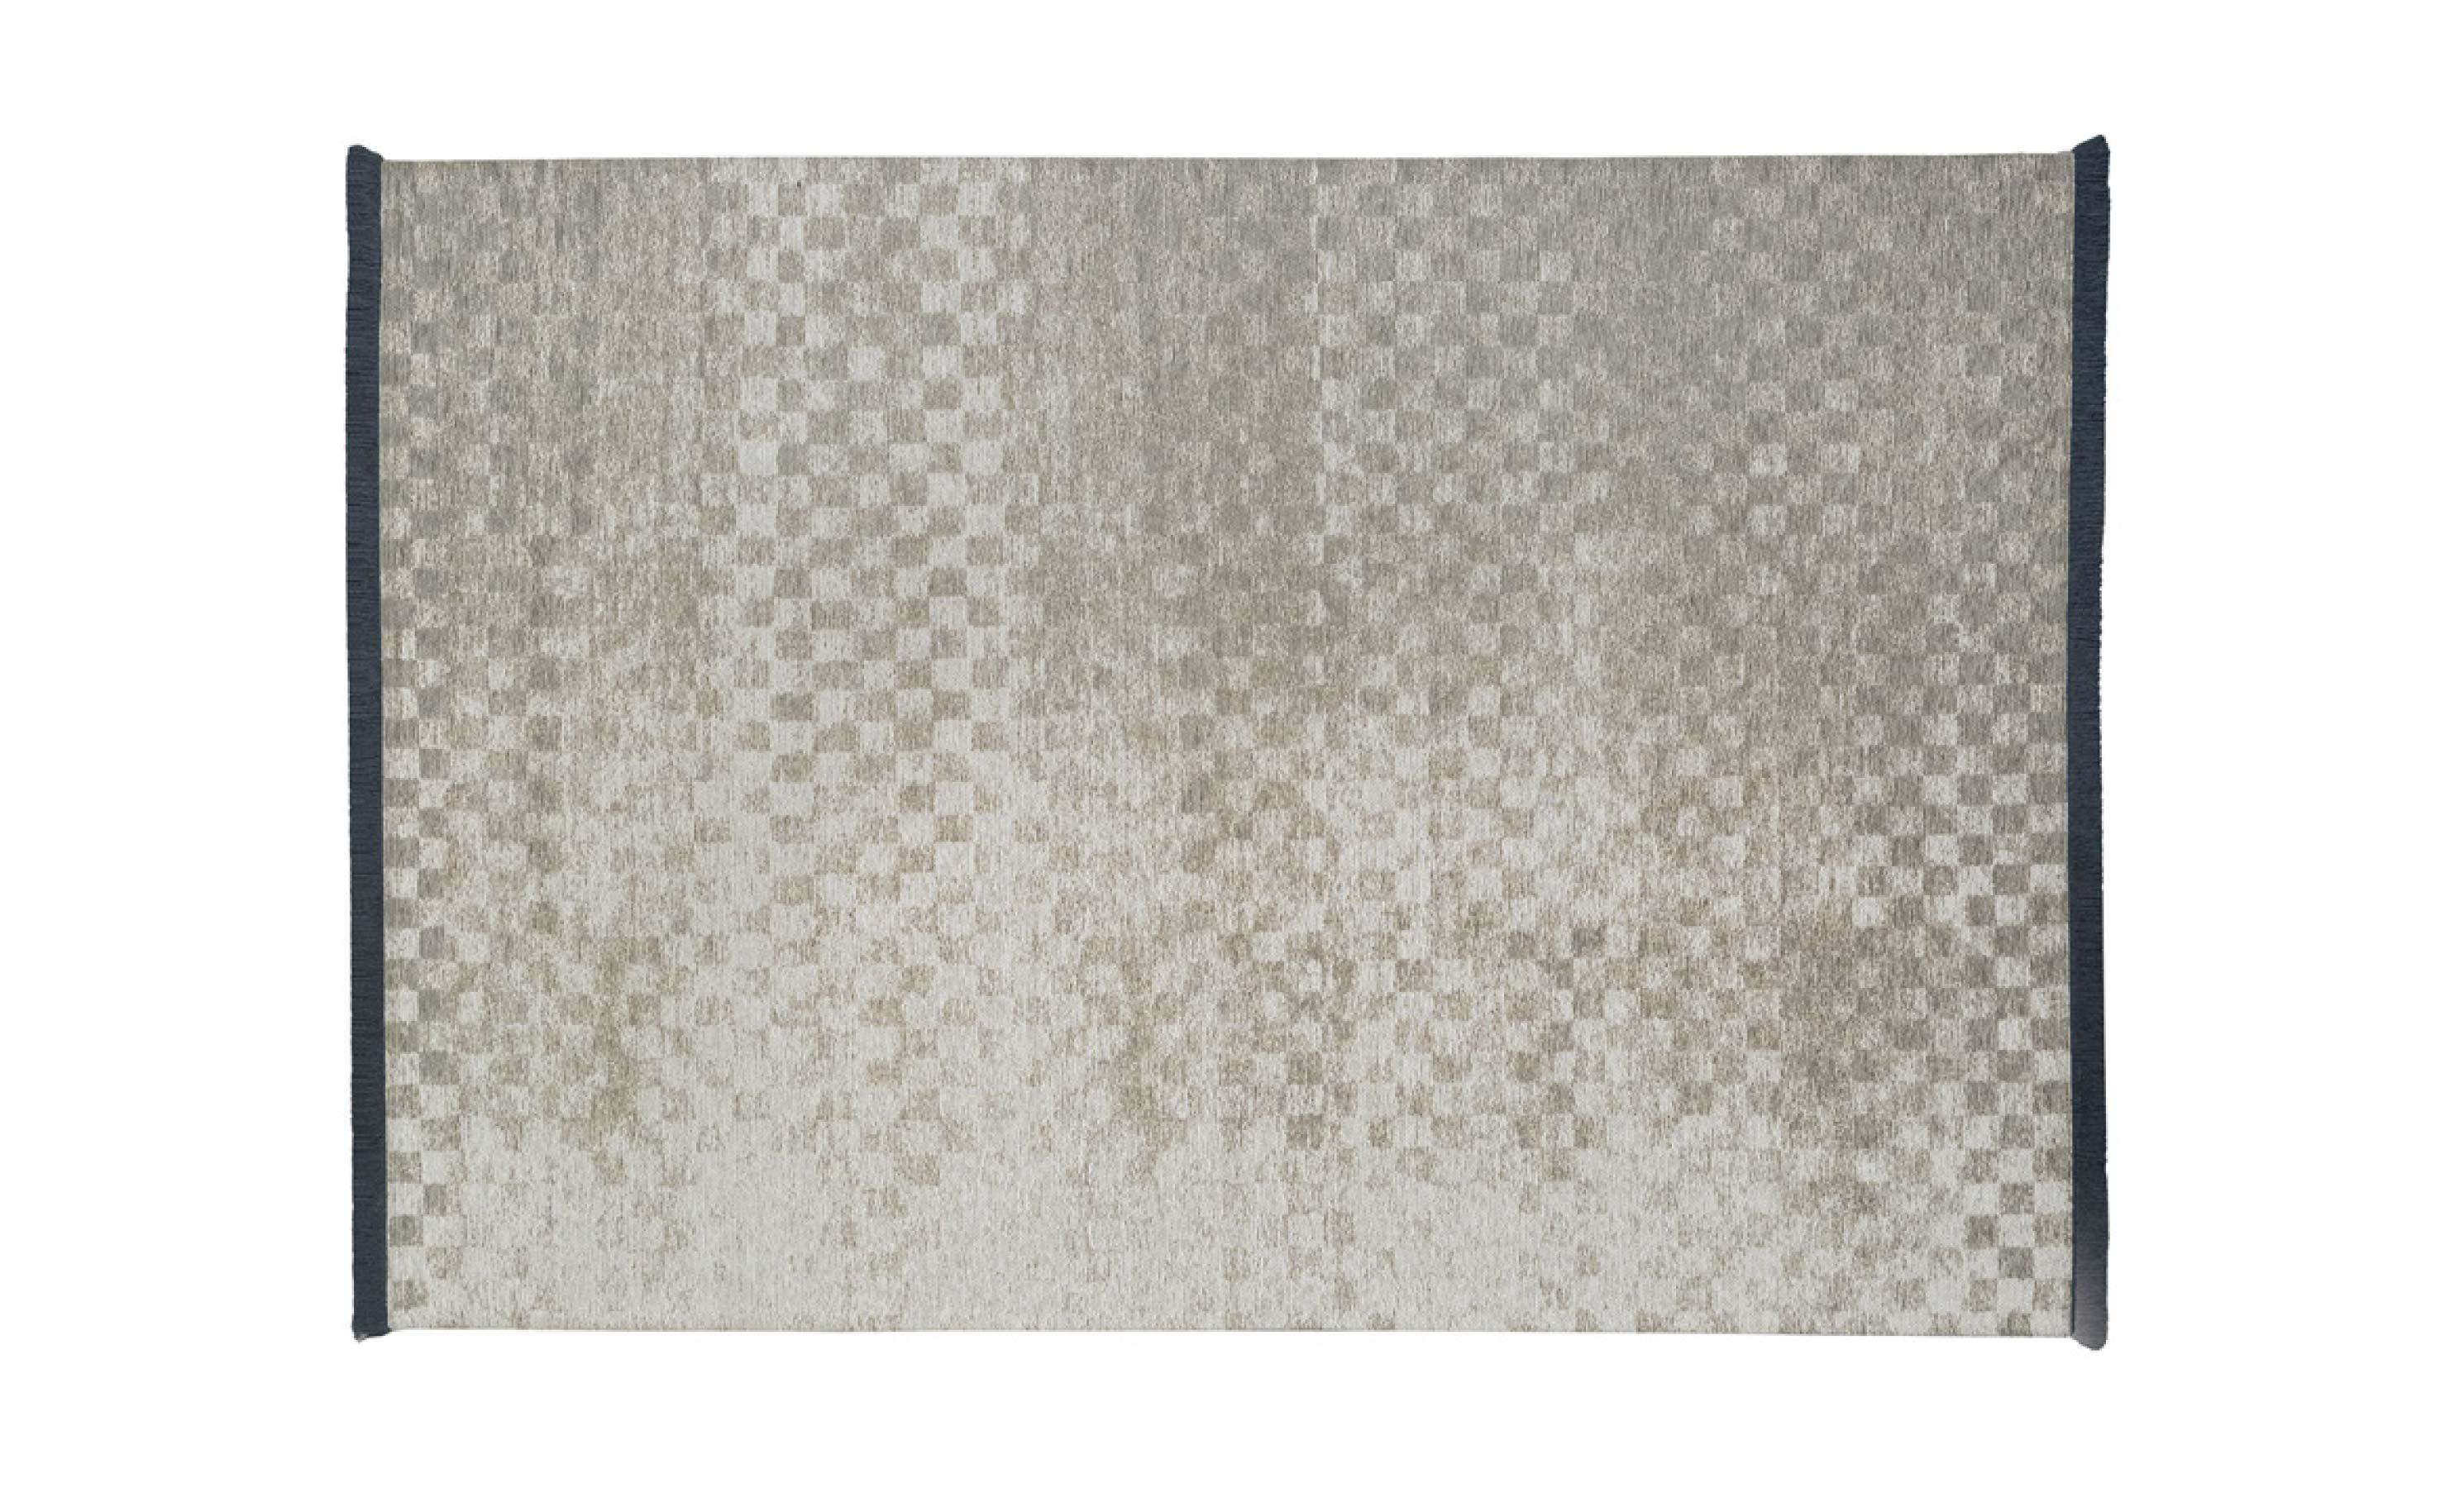 http://desidea.hu/wp-content/uploads/2019/11/tappeto-rug-gradient.jpg